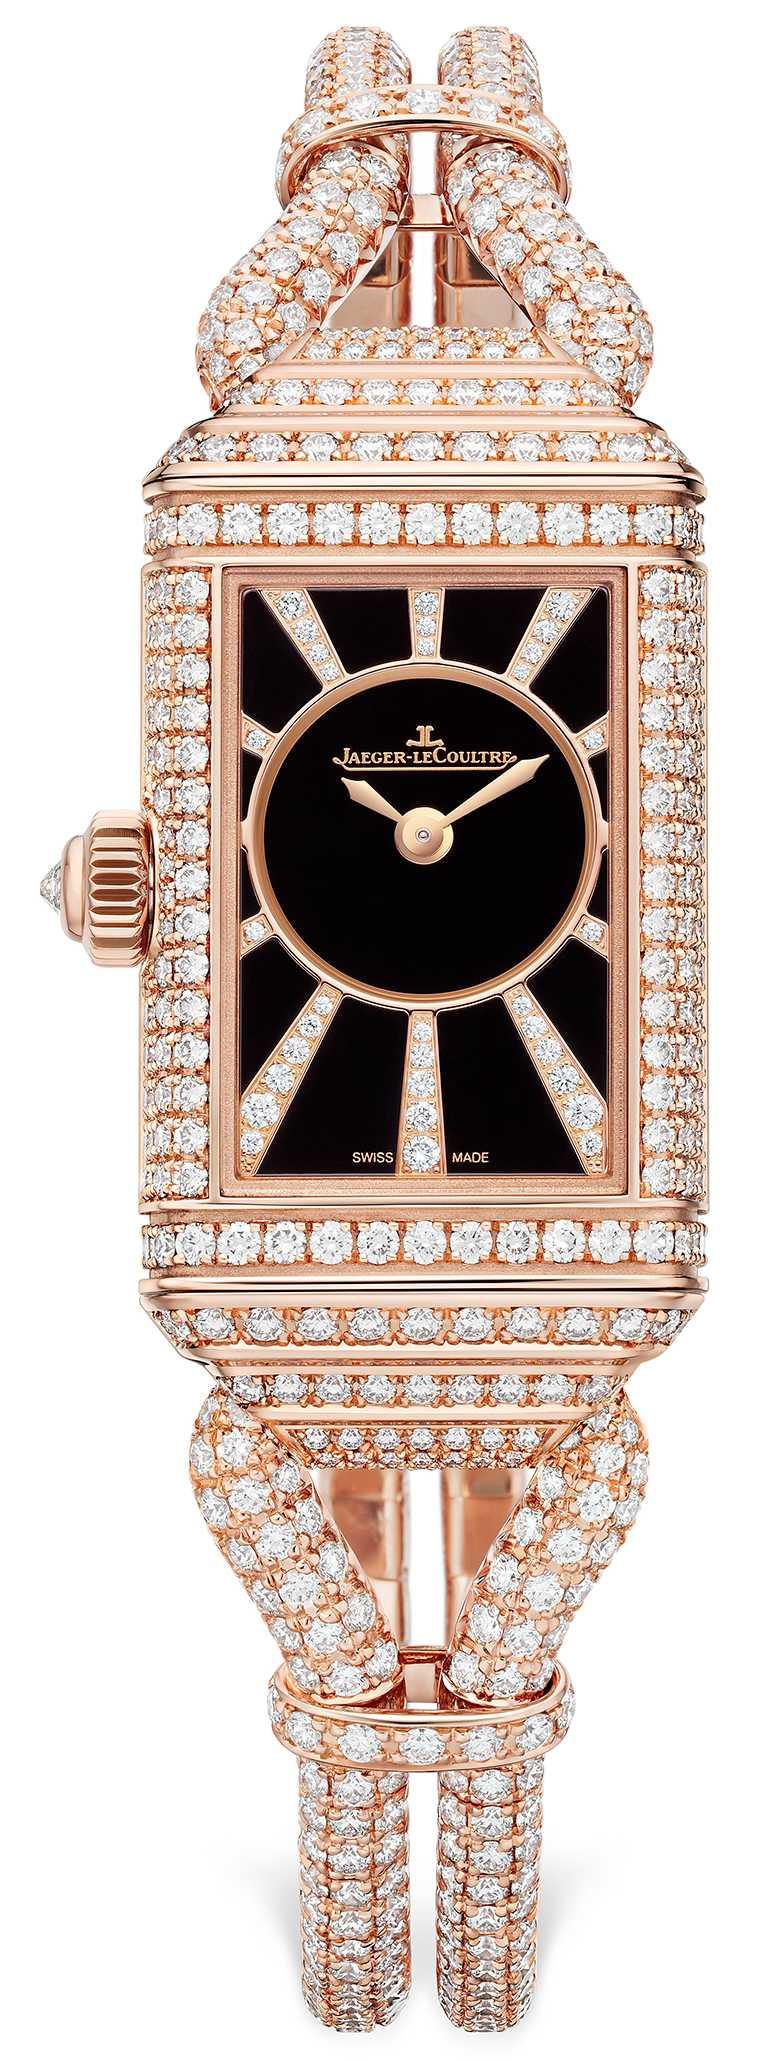 JAEGER-LECOULTRE「Reverso One Cordonnet Jewellery」翻轉系列珠寶腕錶,其所搭載844型手動上鏈機械機芯,能夠同時驅動正、反兩面錶盤上的指針往相反方向轉動。(圖╱JAEGER-LECOULTRE提供)